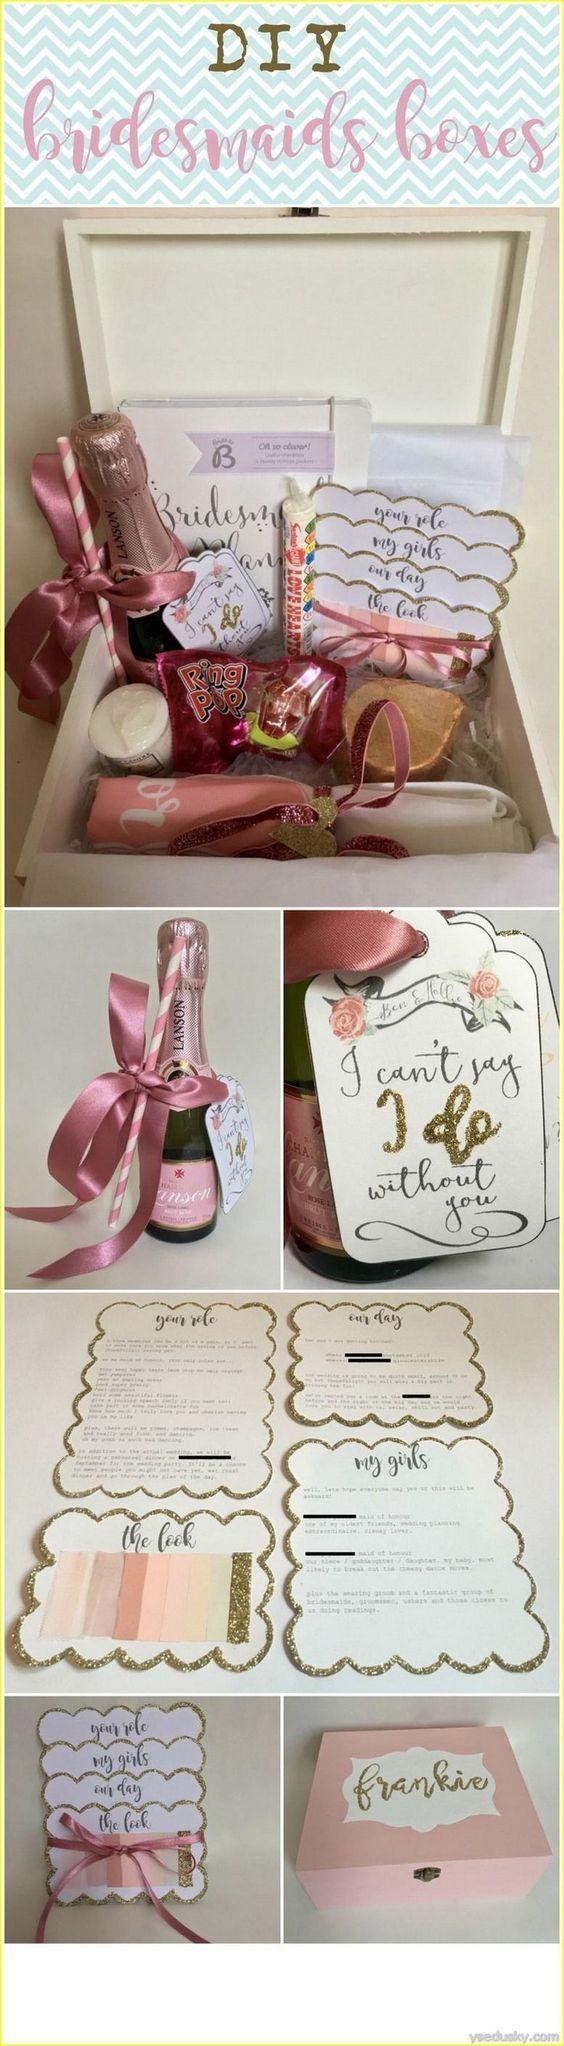 nice 50 Best Bridesmaid Gifts DIY Cheap and Simple #bridemaidsgiftsdiycheap